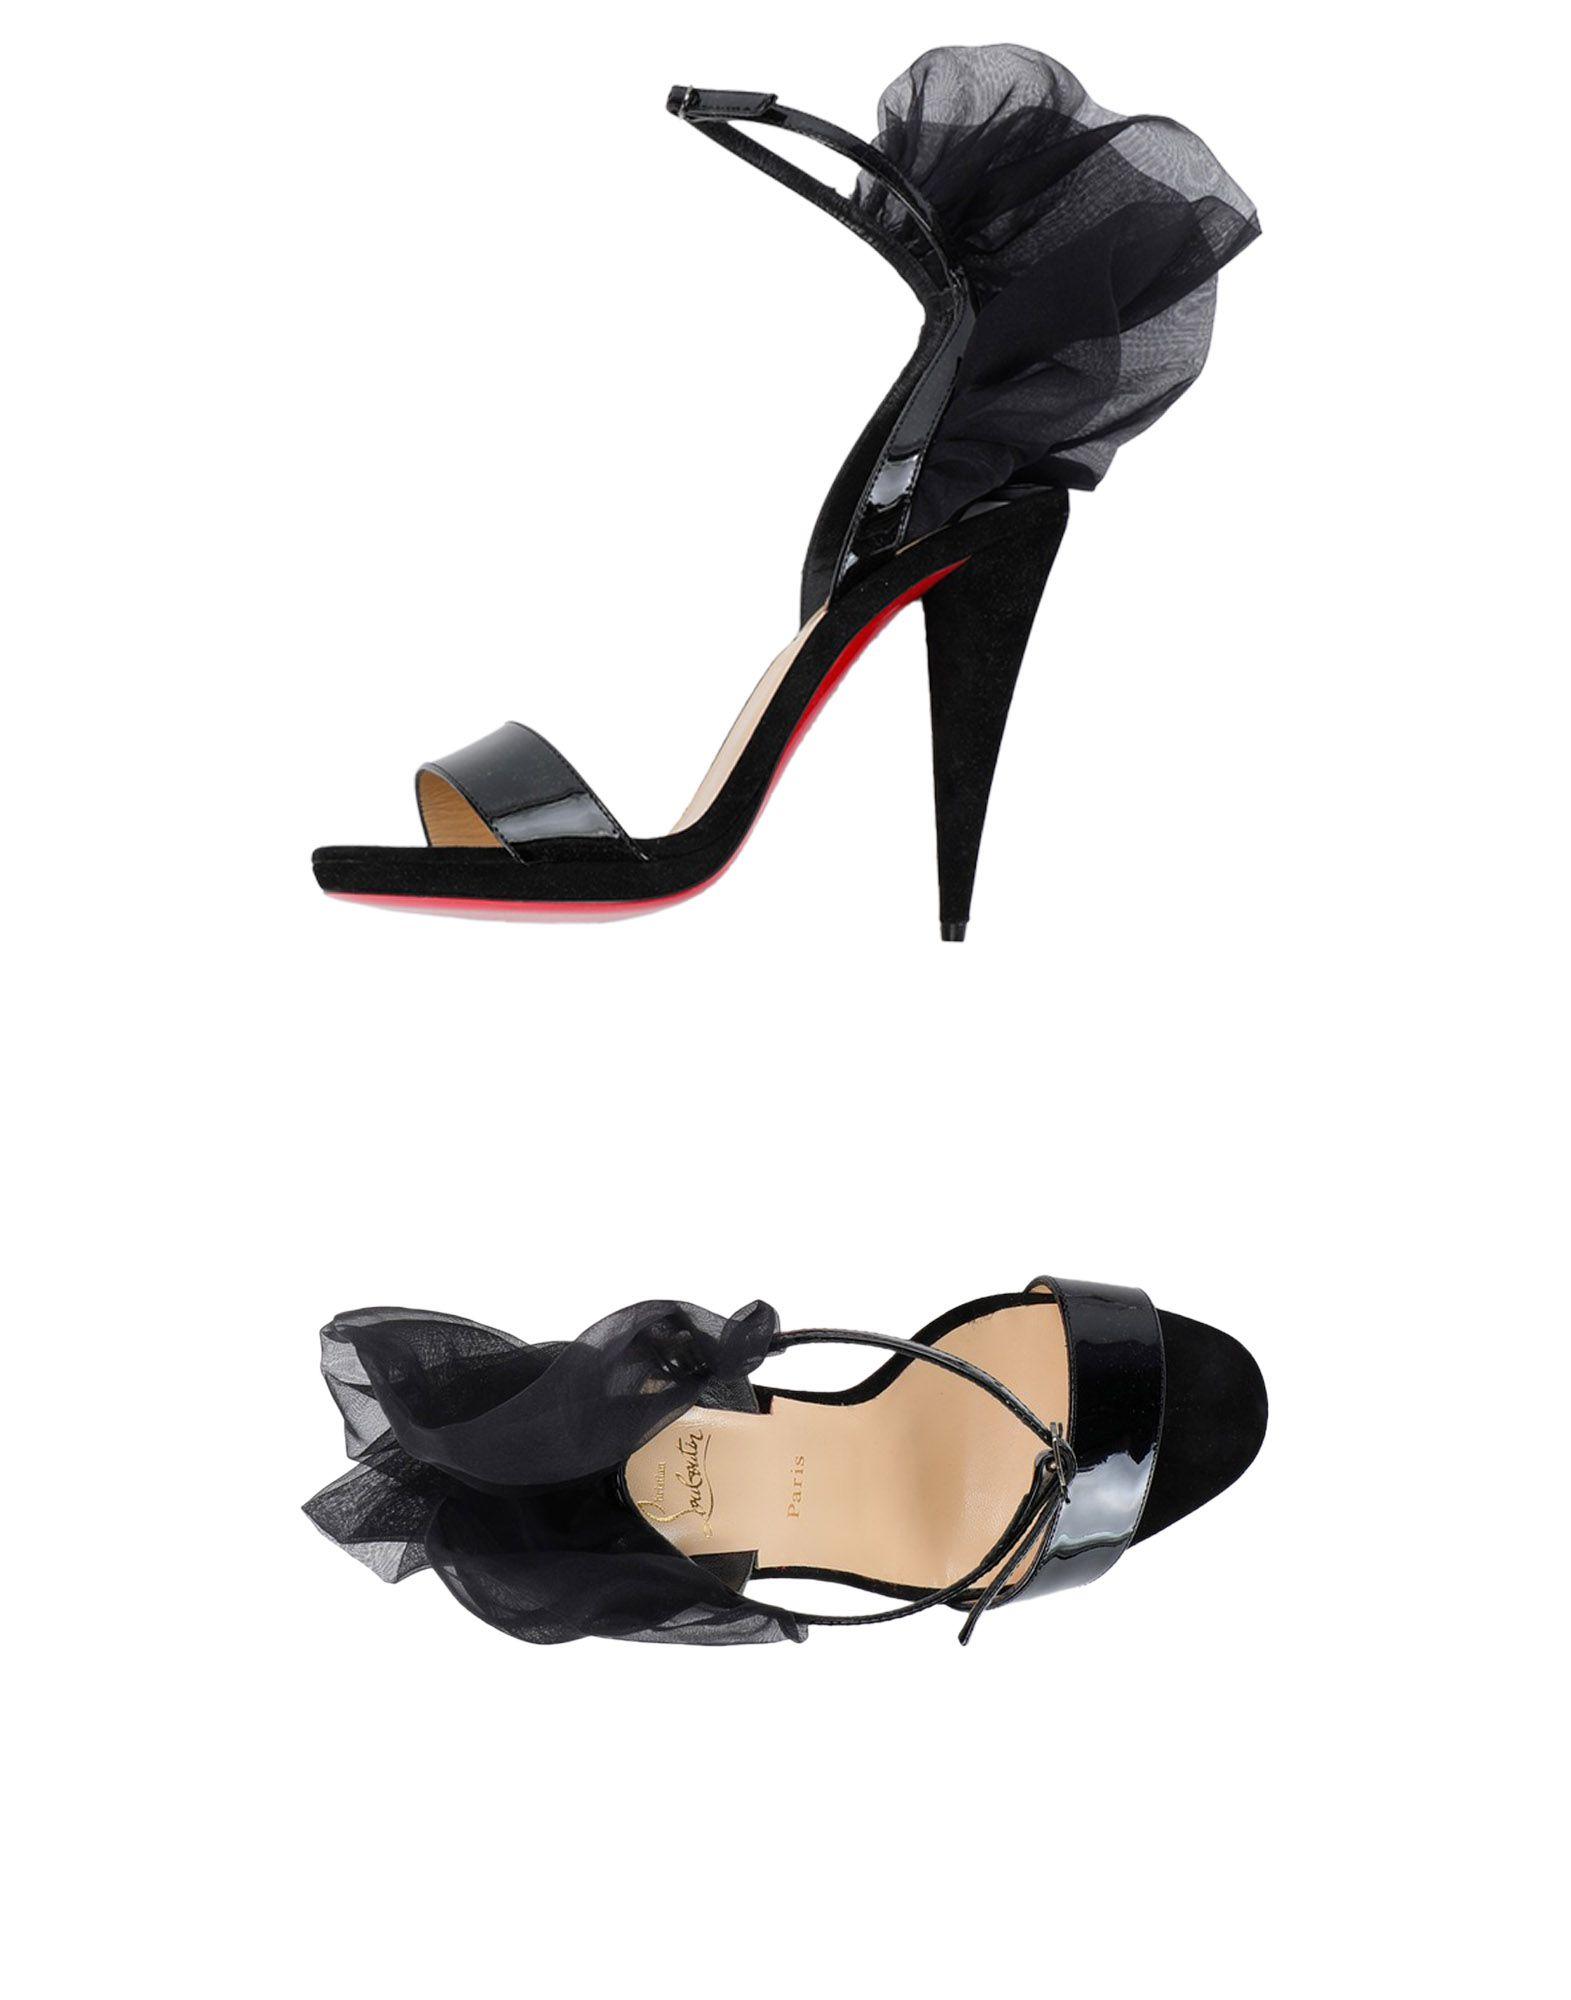 Christian Christian Louboutin Sandals - Women Christian Christian Louboutin Sandals online on  Australia - 11518751XO 1d1194